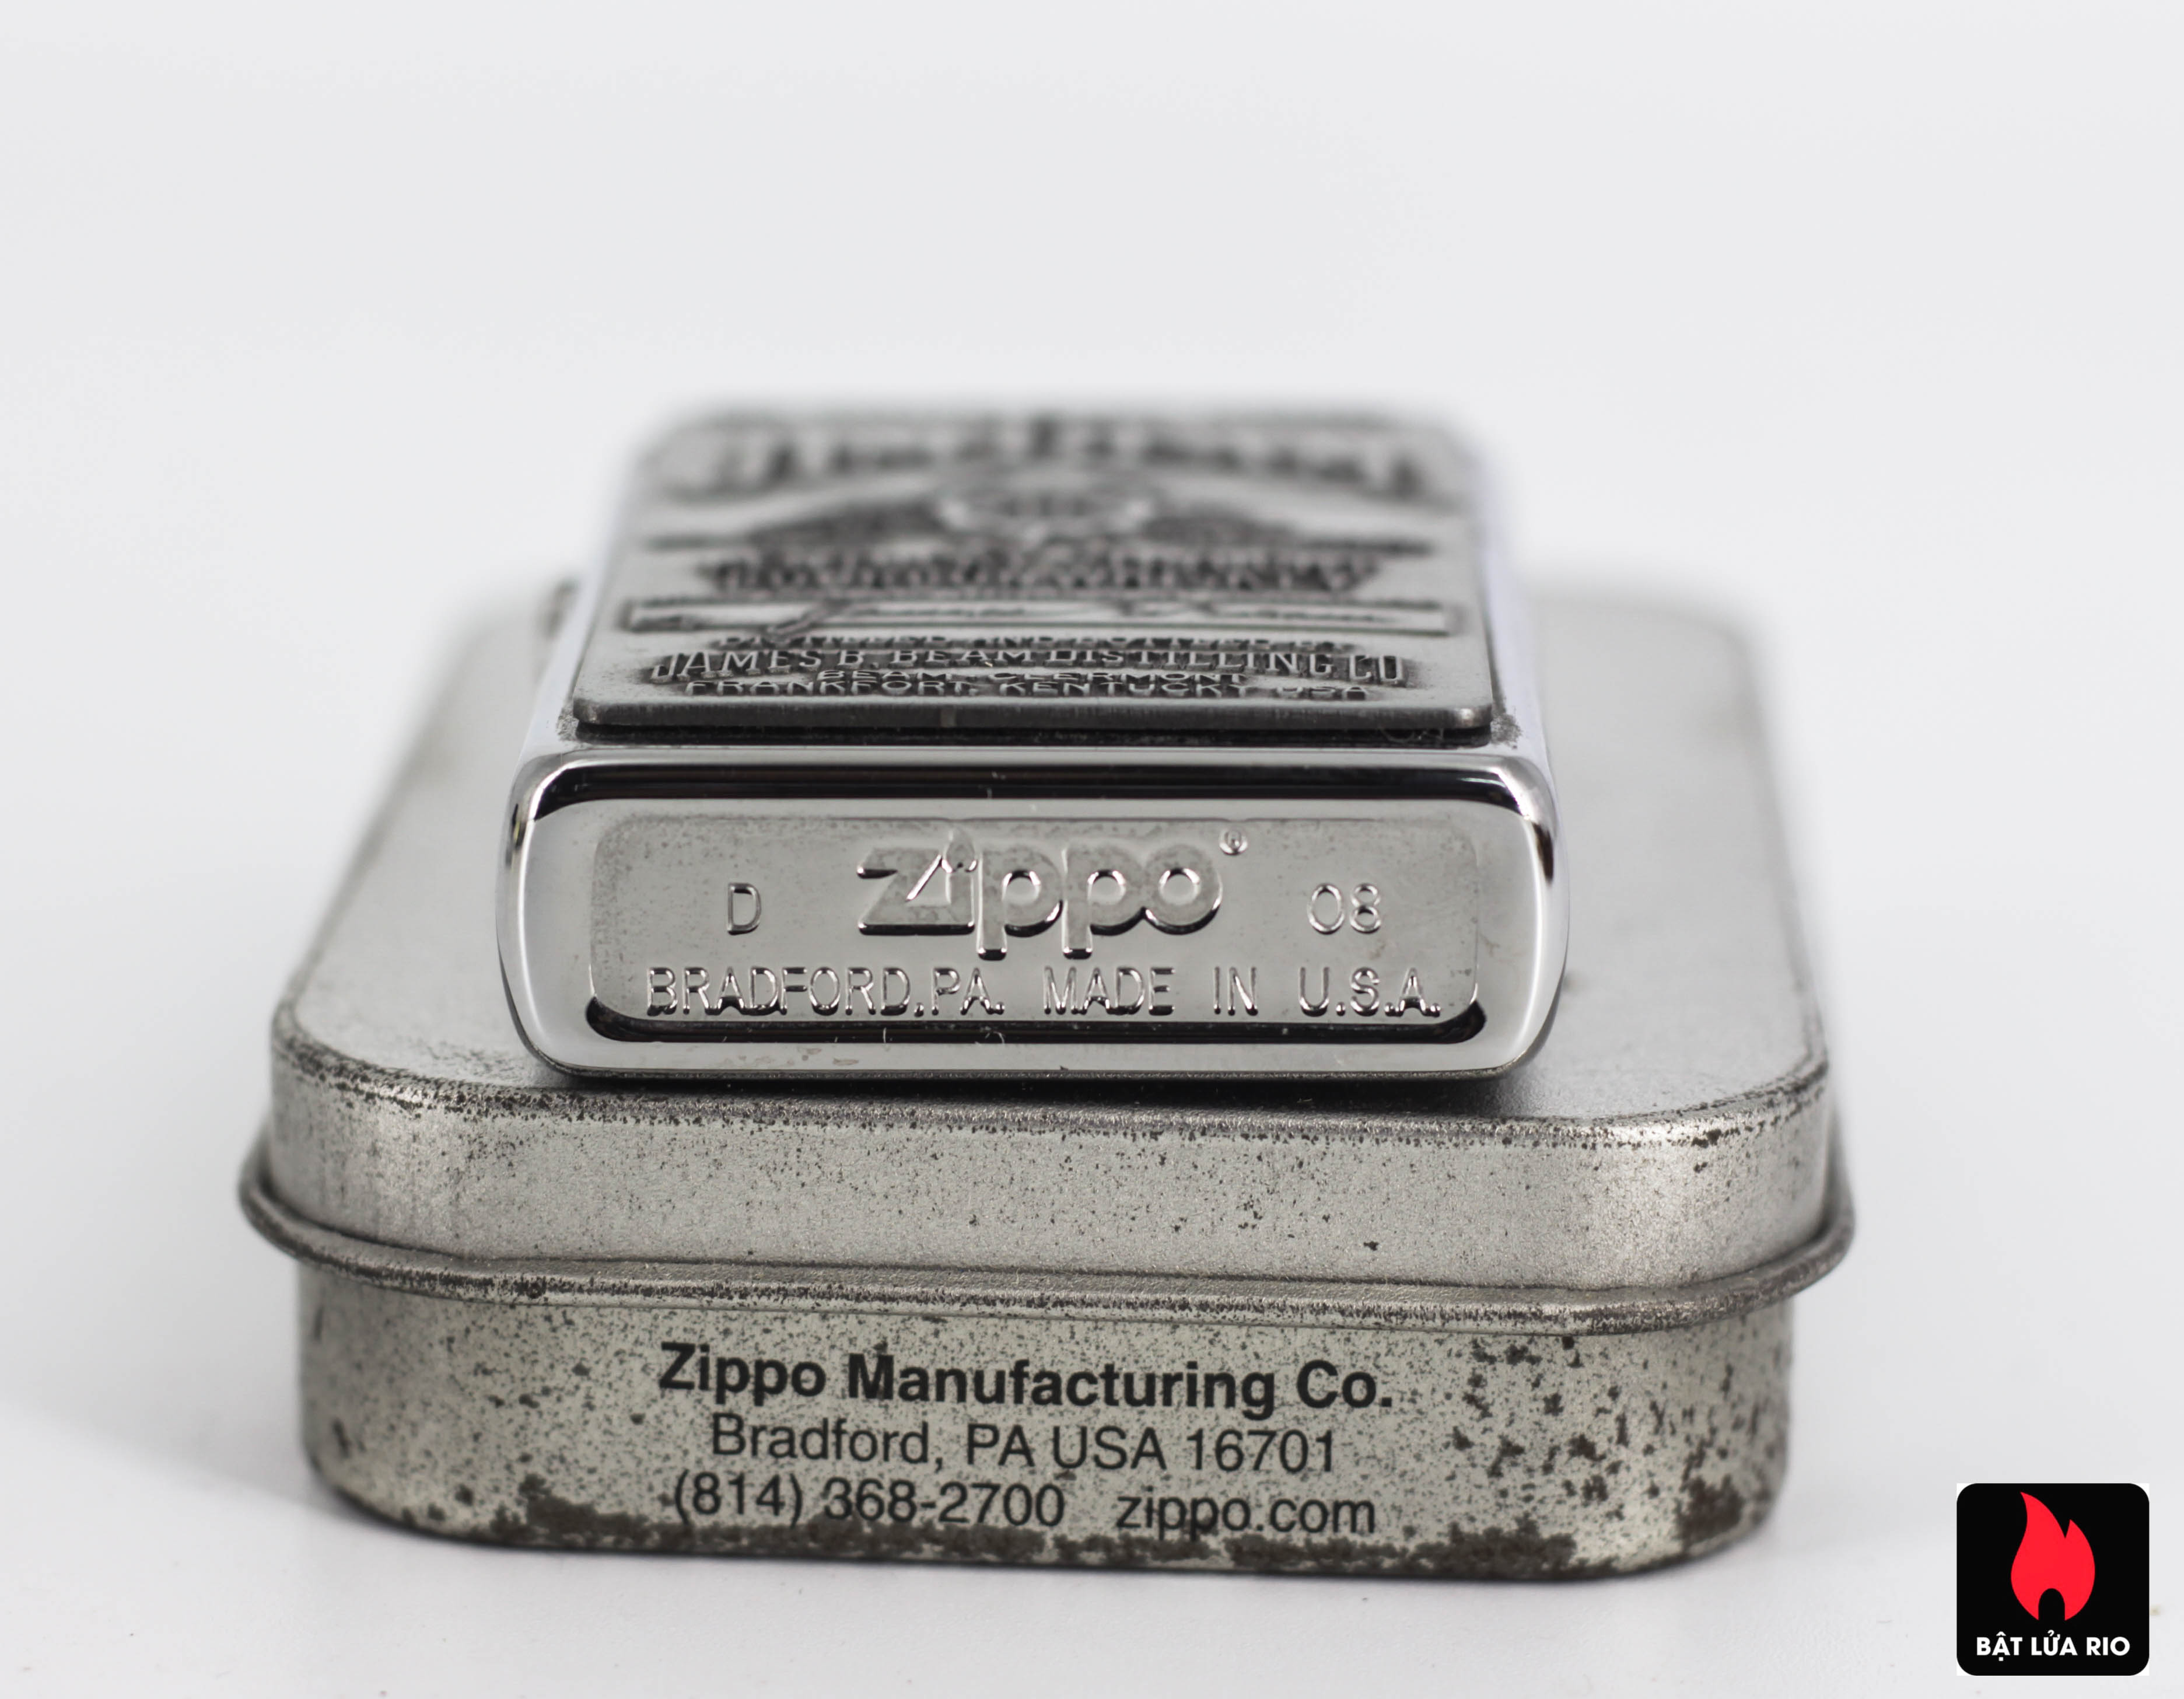 Zippo 2008 - Zippo Jim Beam Emblem High Polish Chrome 3